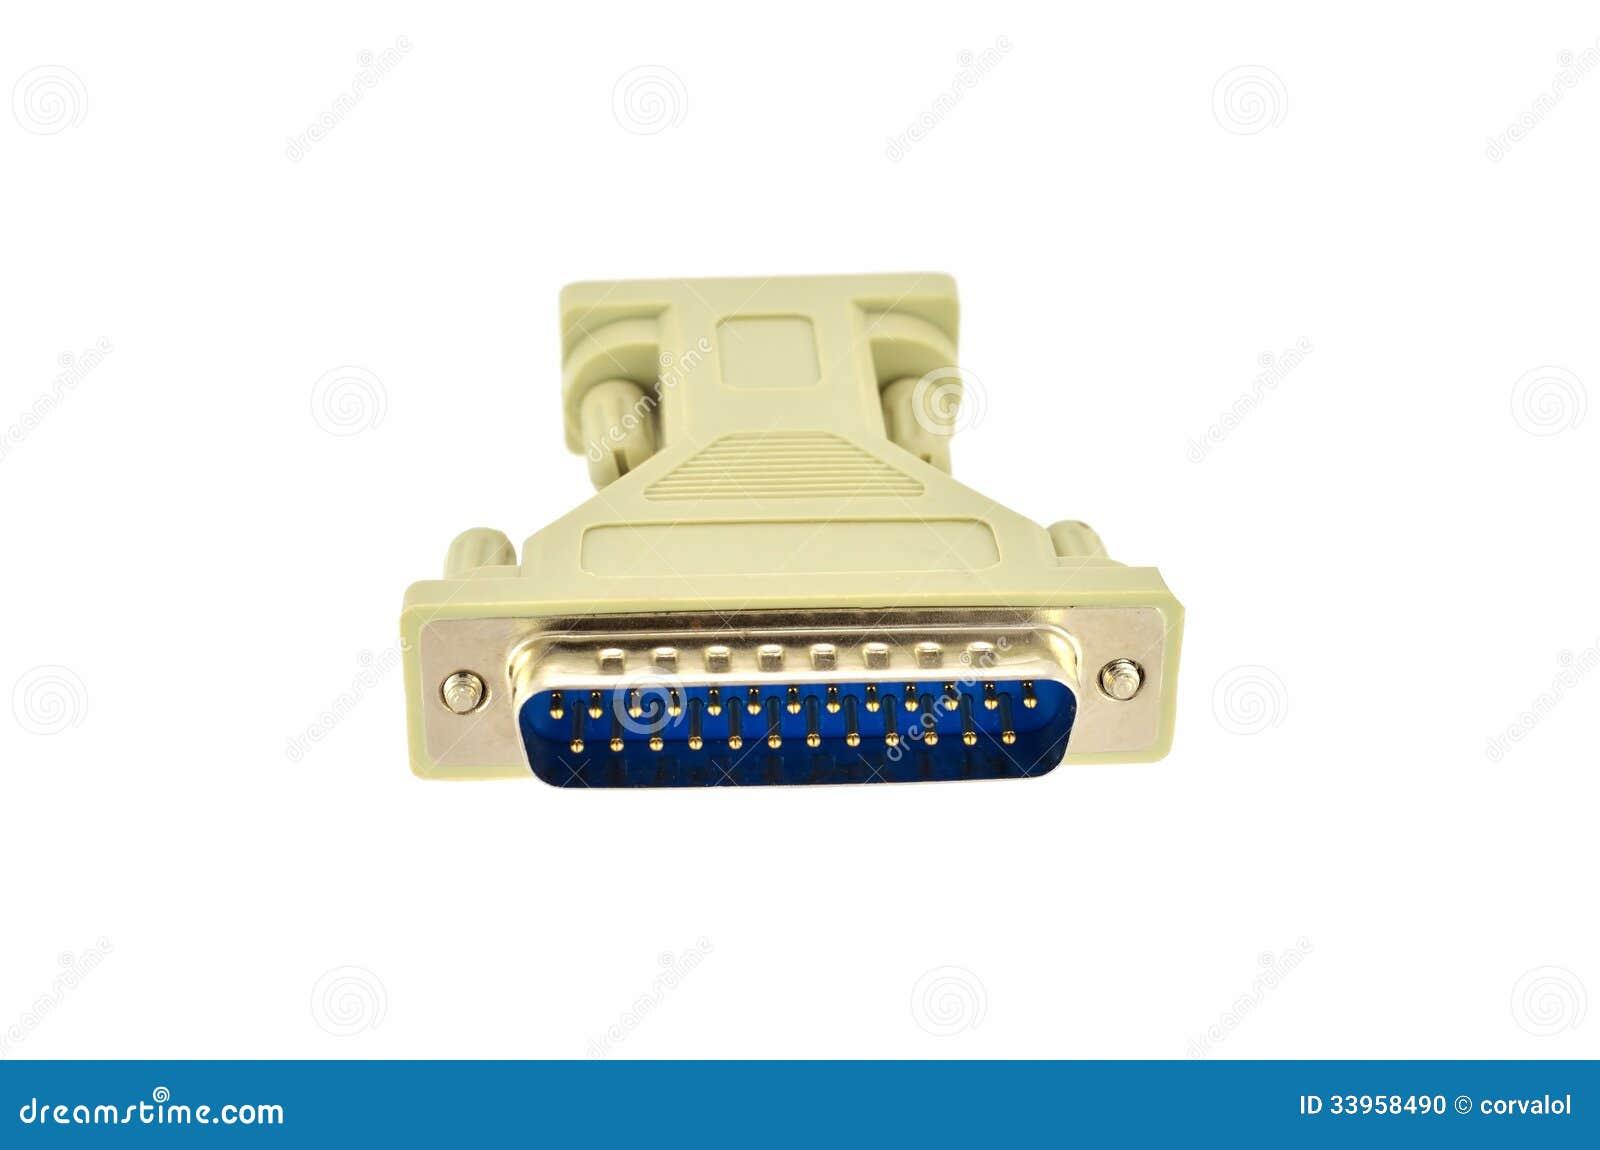 Computer Monitor Plug : D sub plug and socket adapter stock photo image